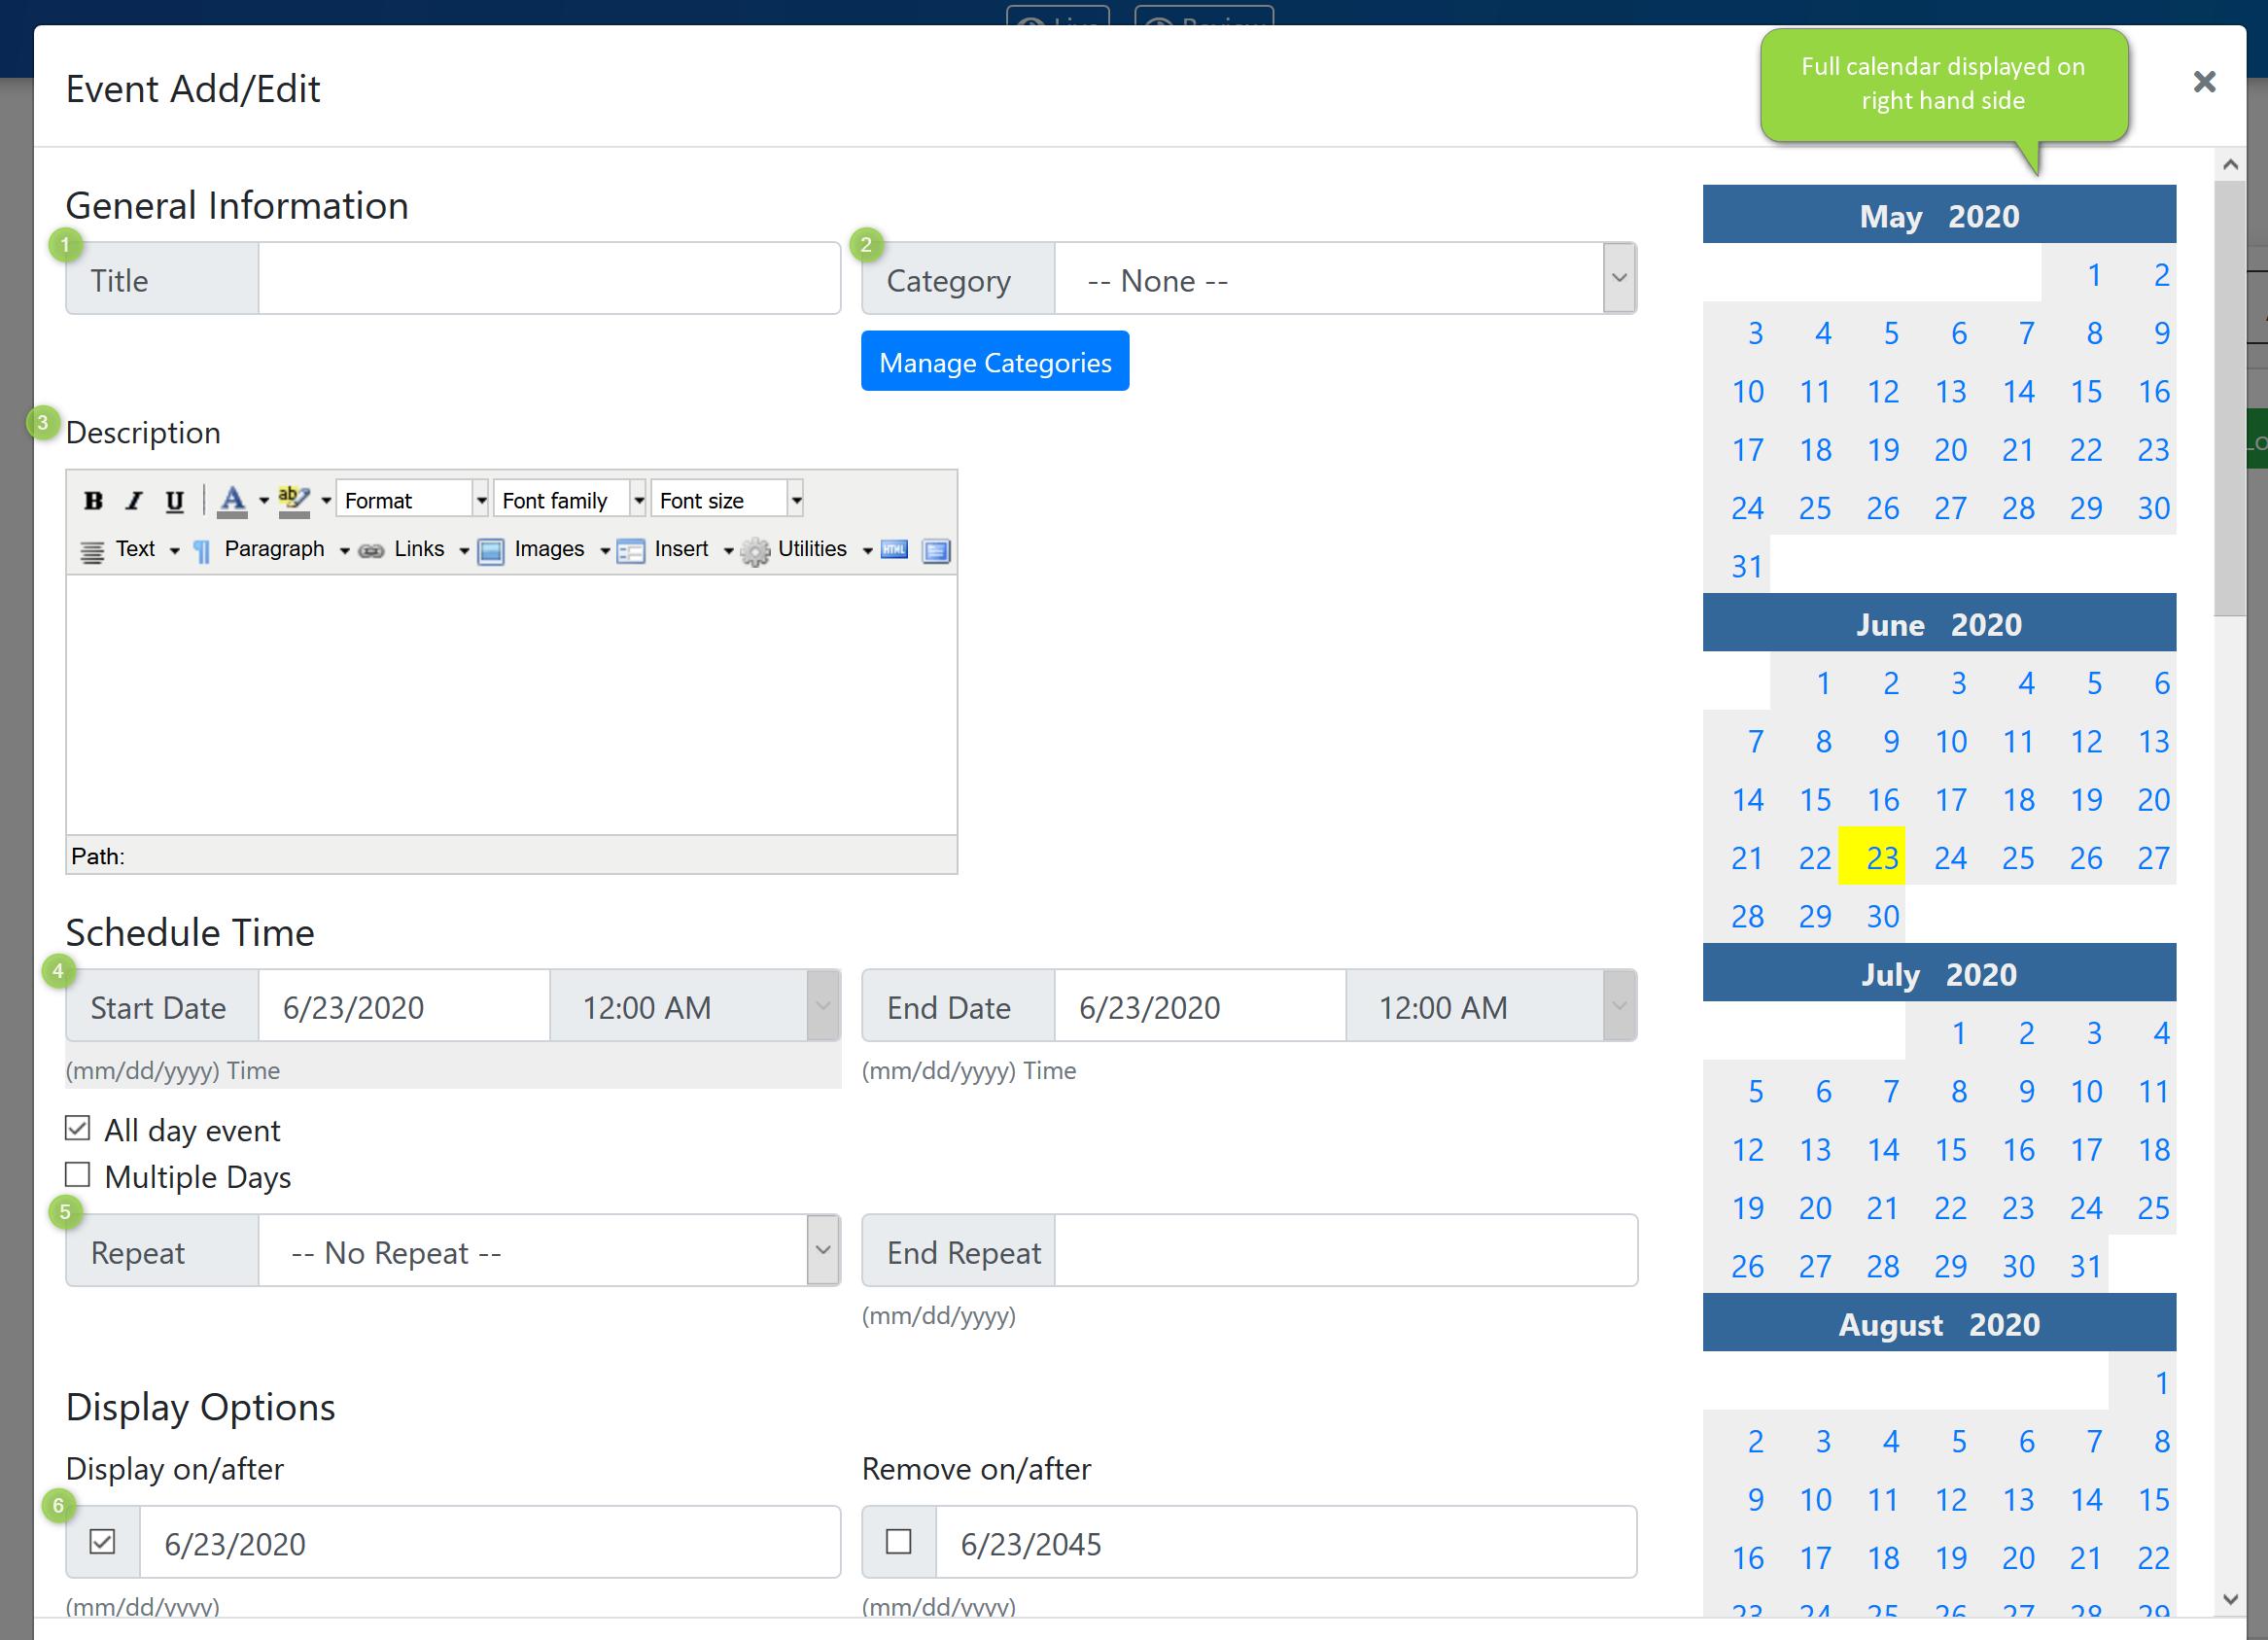 Add/Edit Event Screenshot